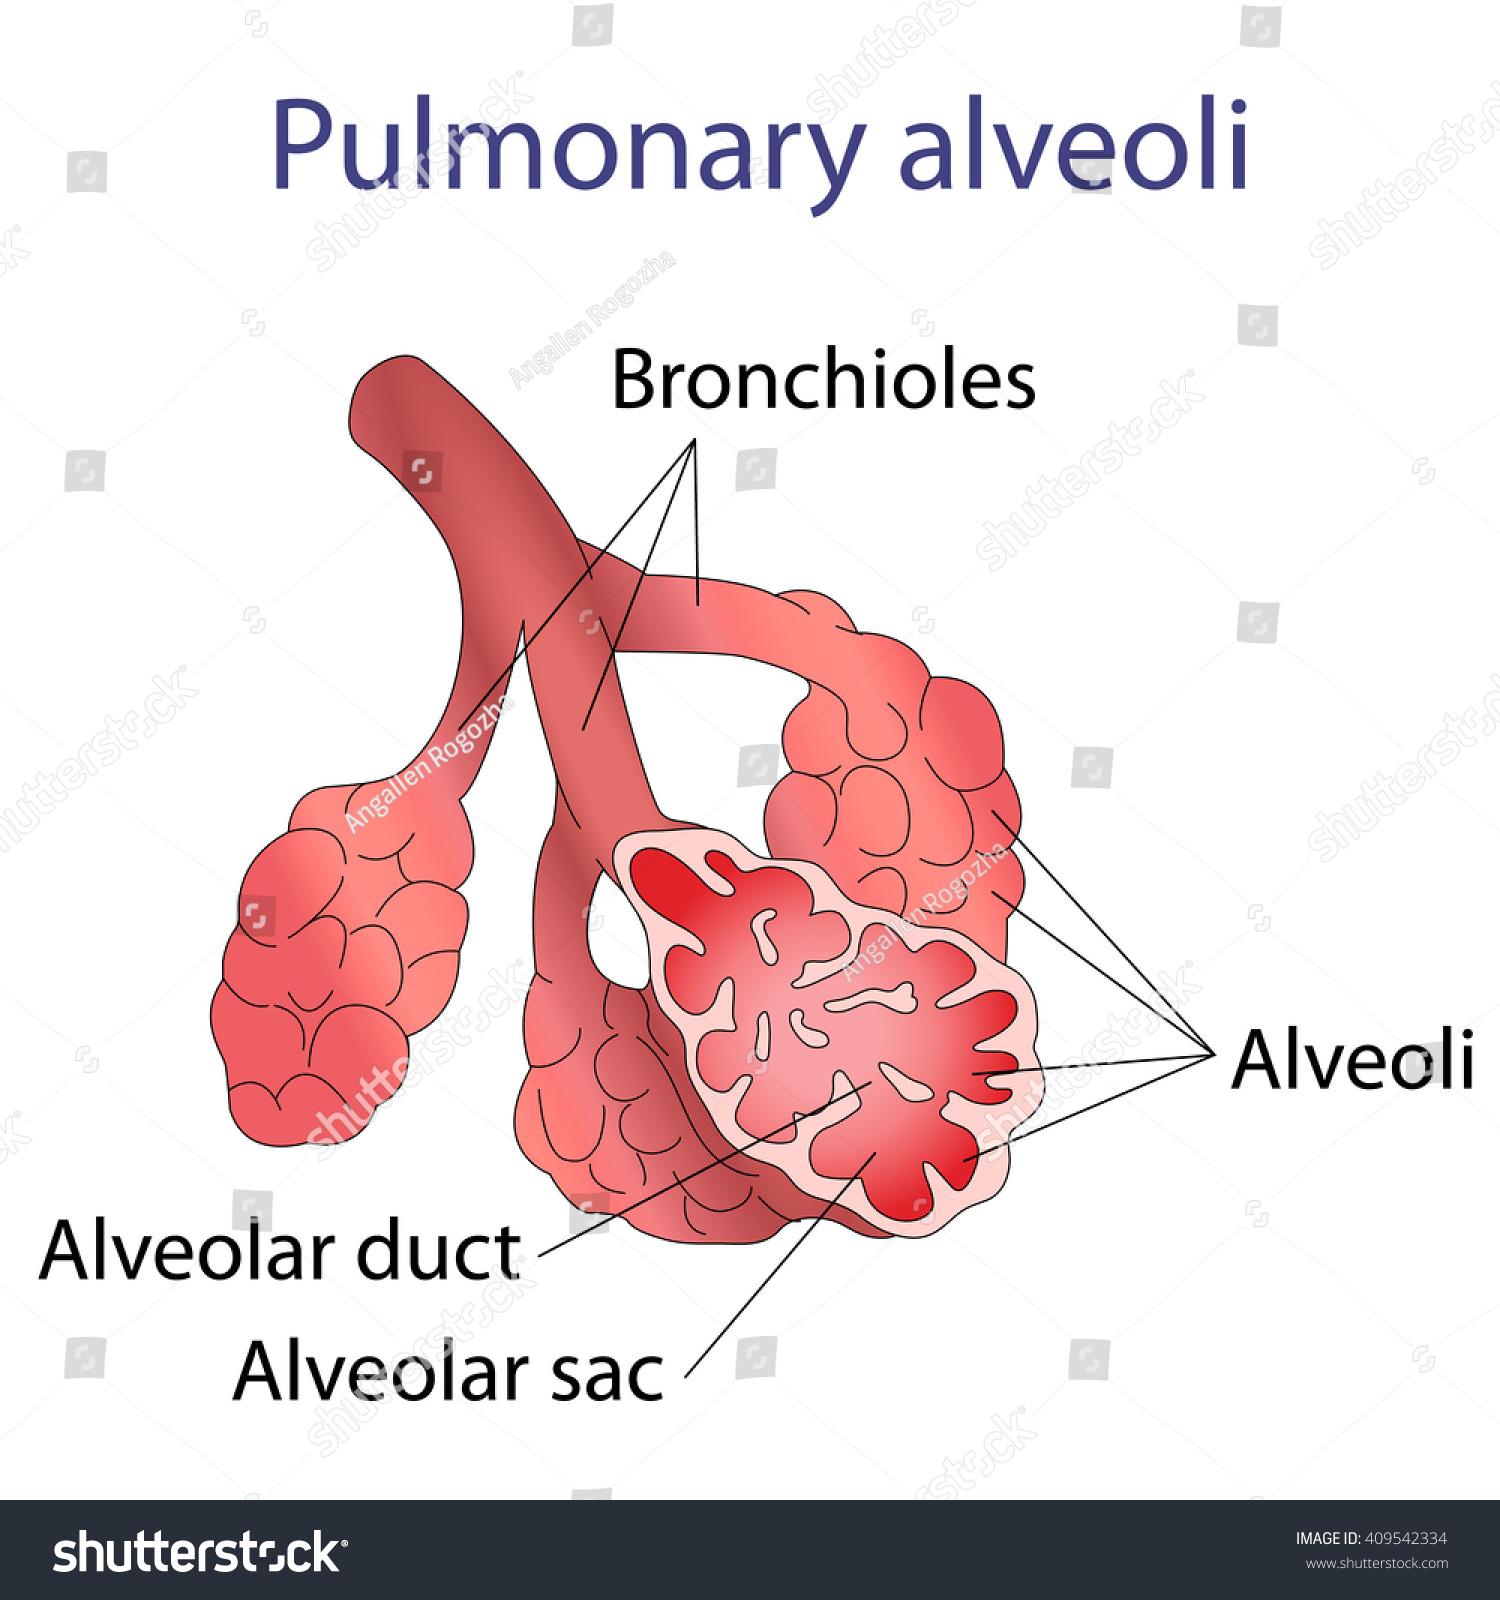 Illustration Human Alveoli Structure Stock Vector (Royalty Free ...